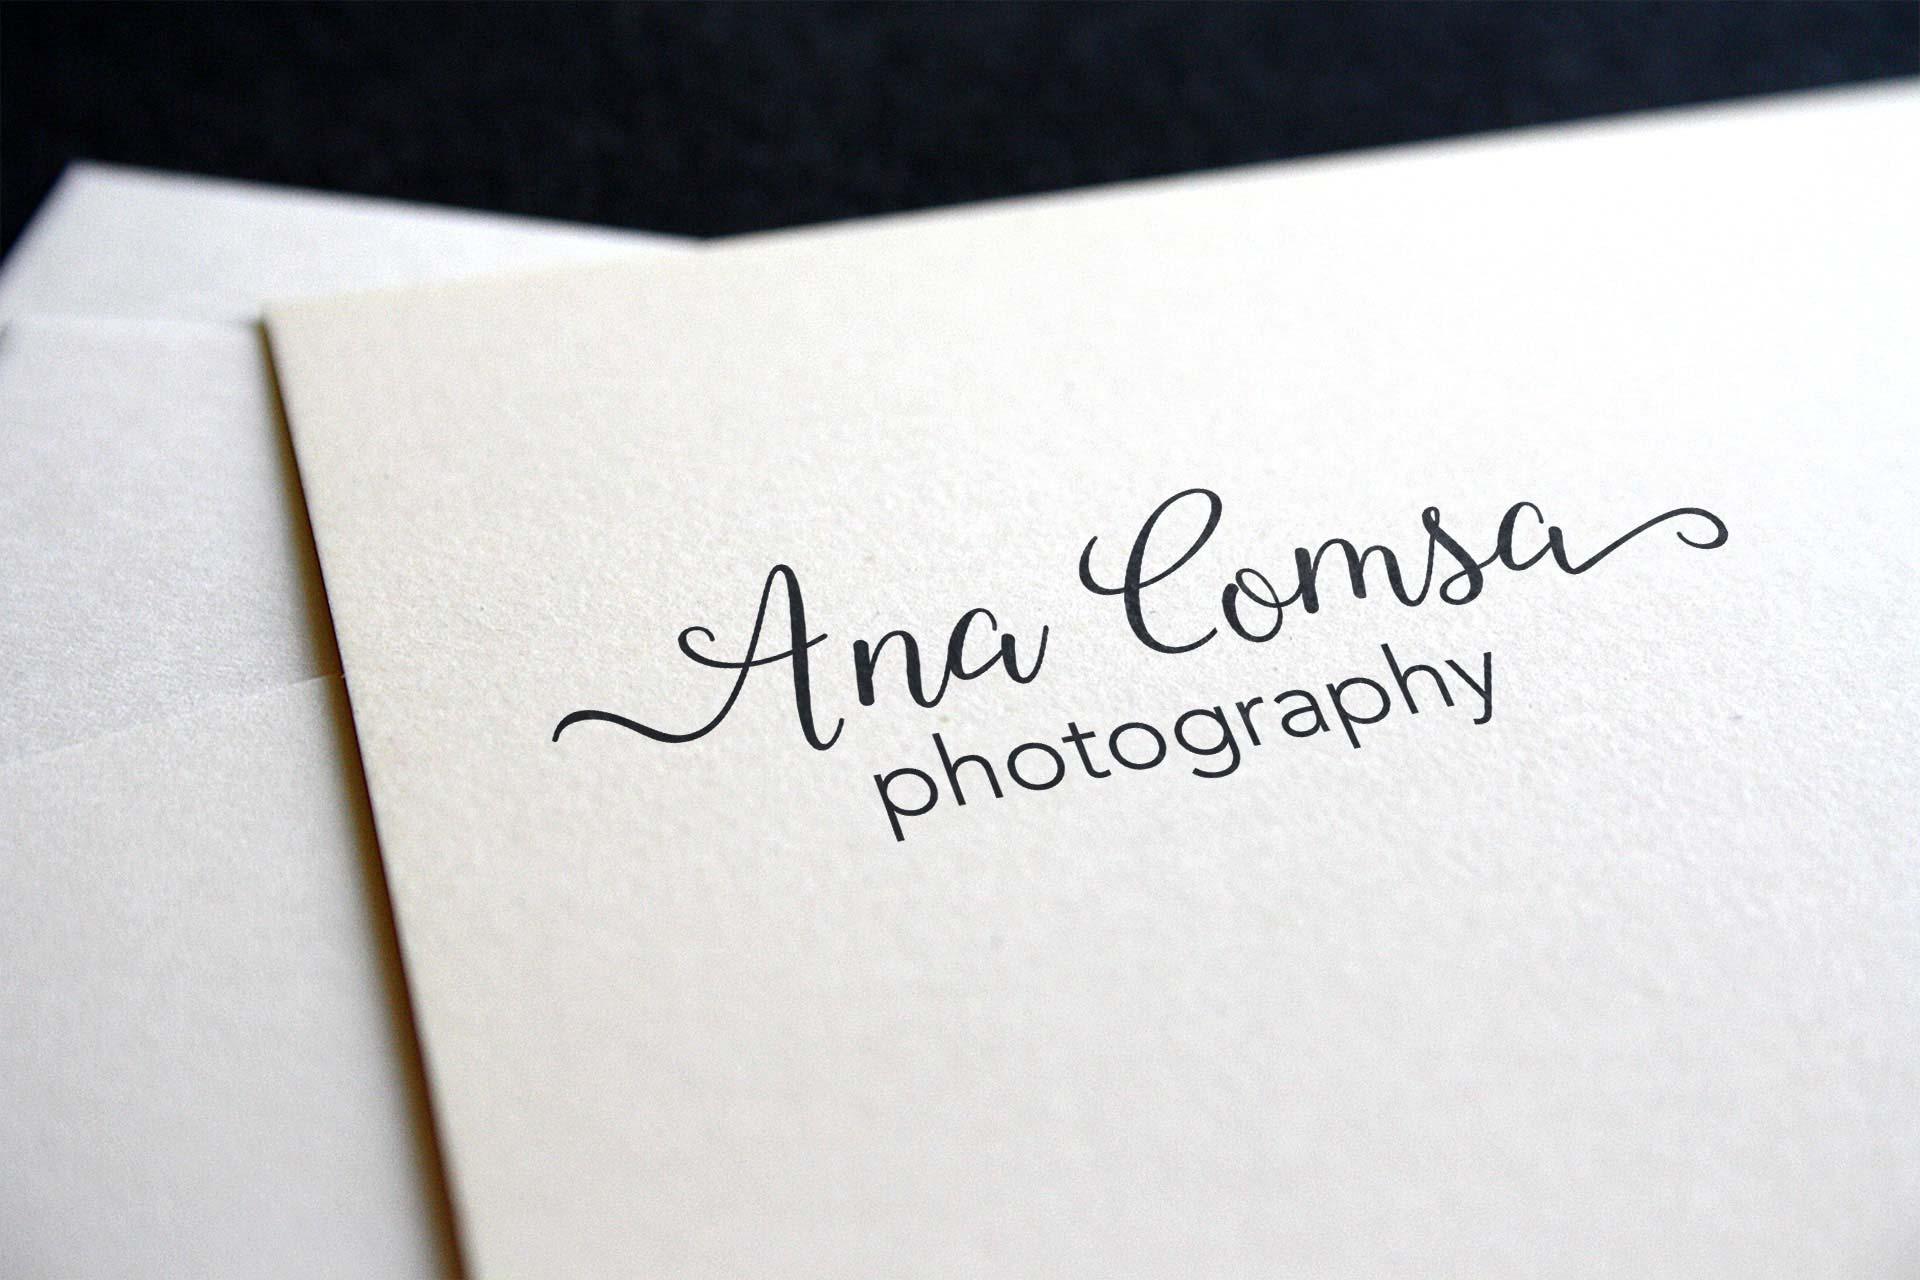 Logo-AnaComsa